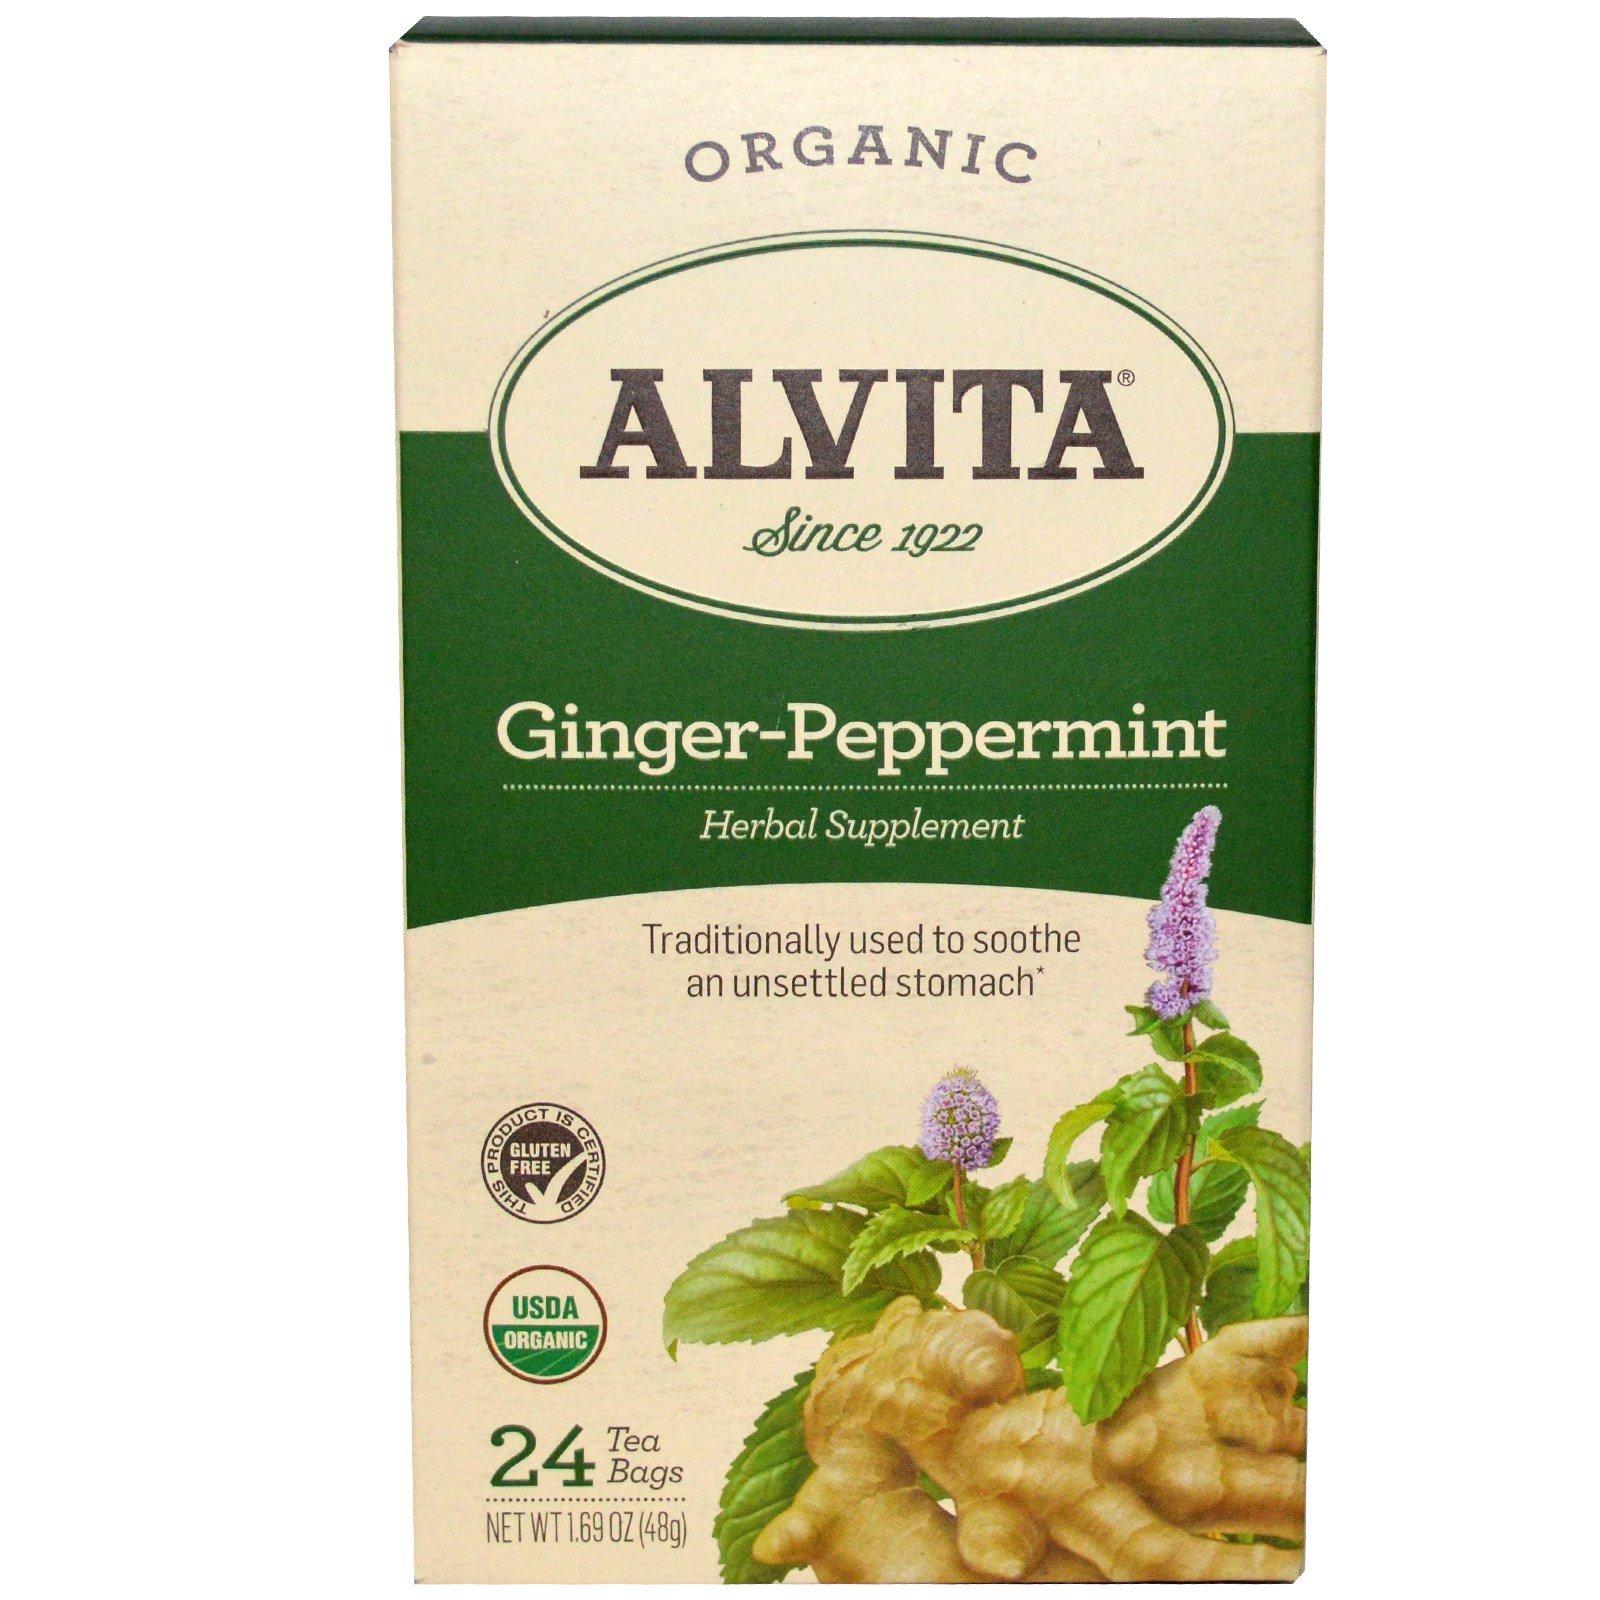 Alvita Teas, Ginger-Peppermint, Organic, Caffeine Free, 24 Tea Bag, 1.69 oz (48 g) - 3PC by  (Image #1)